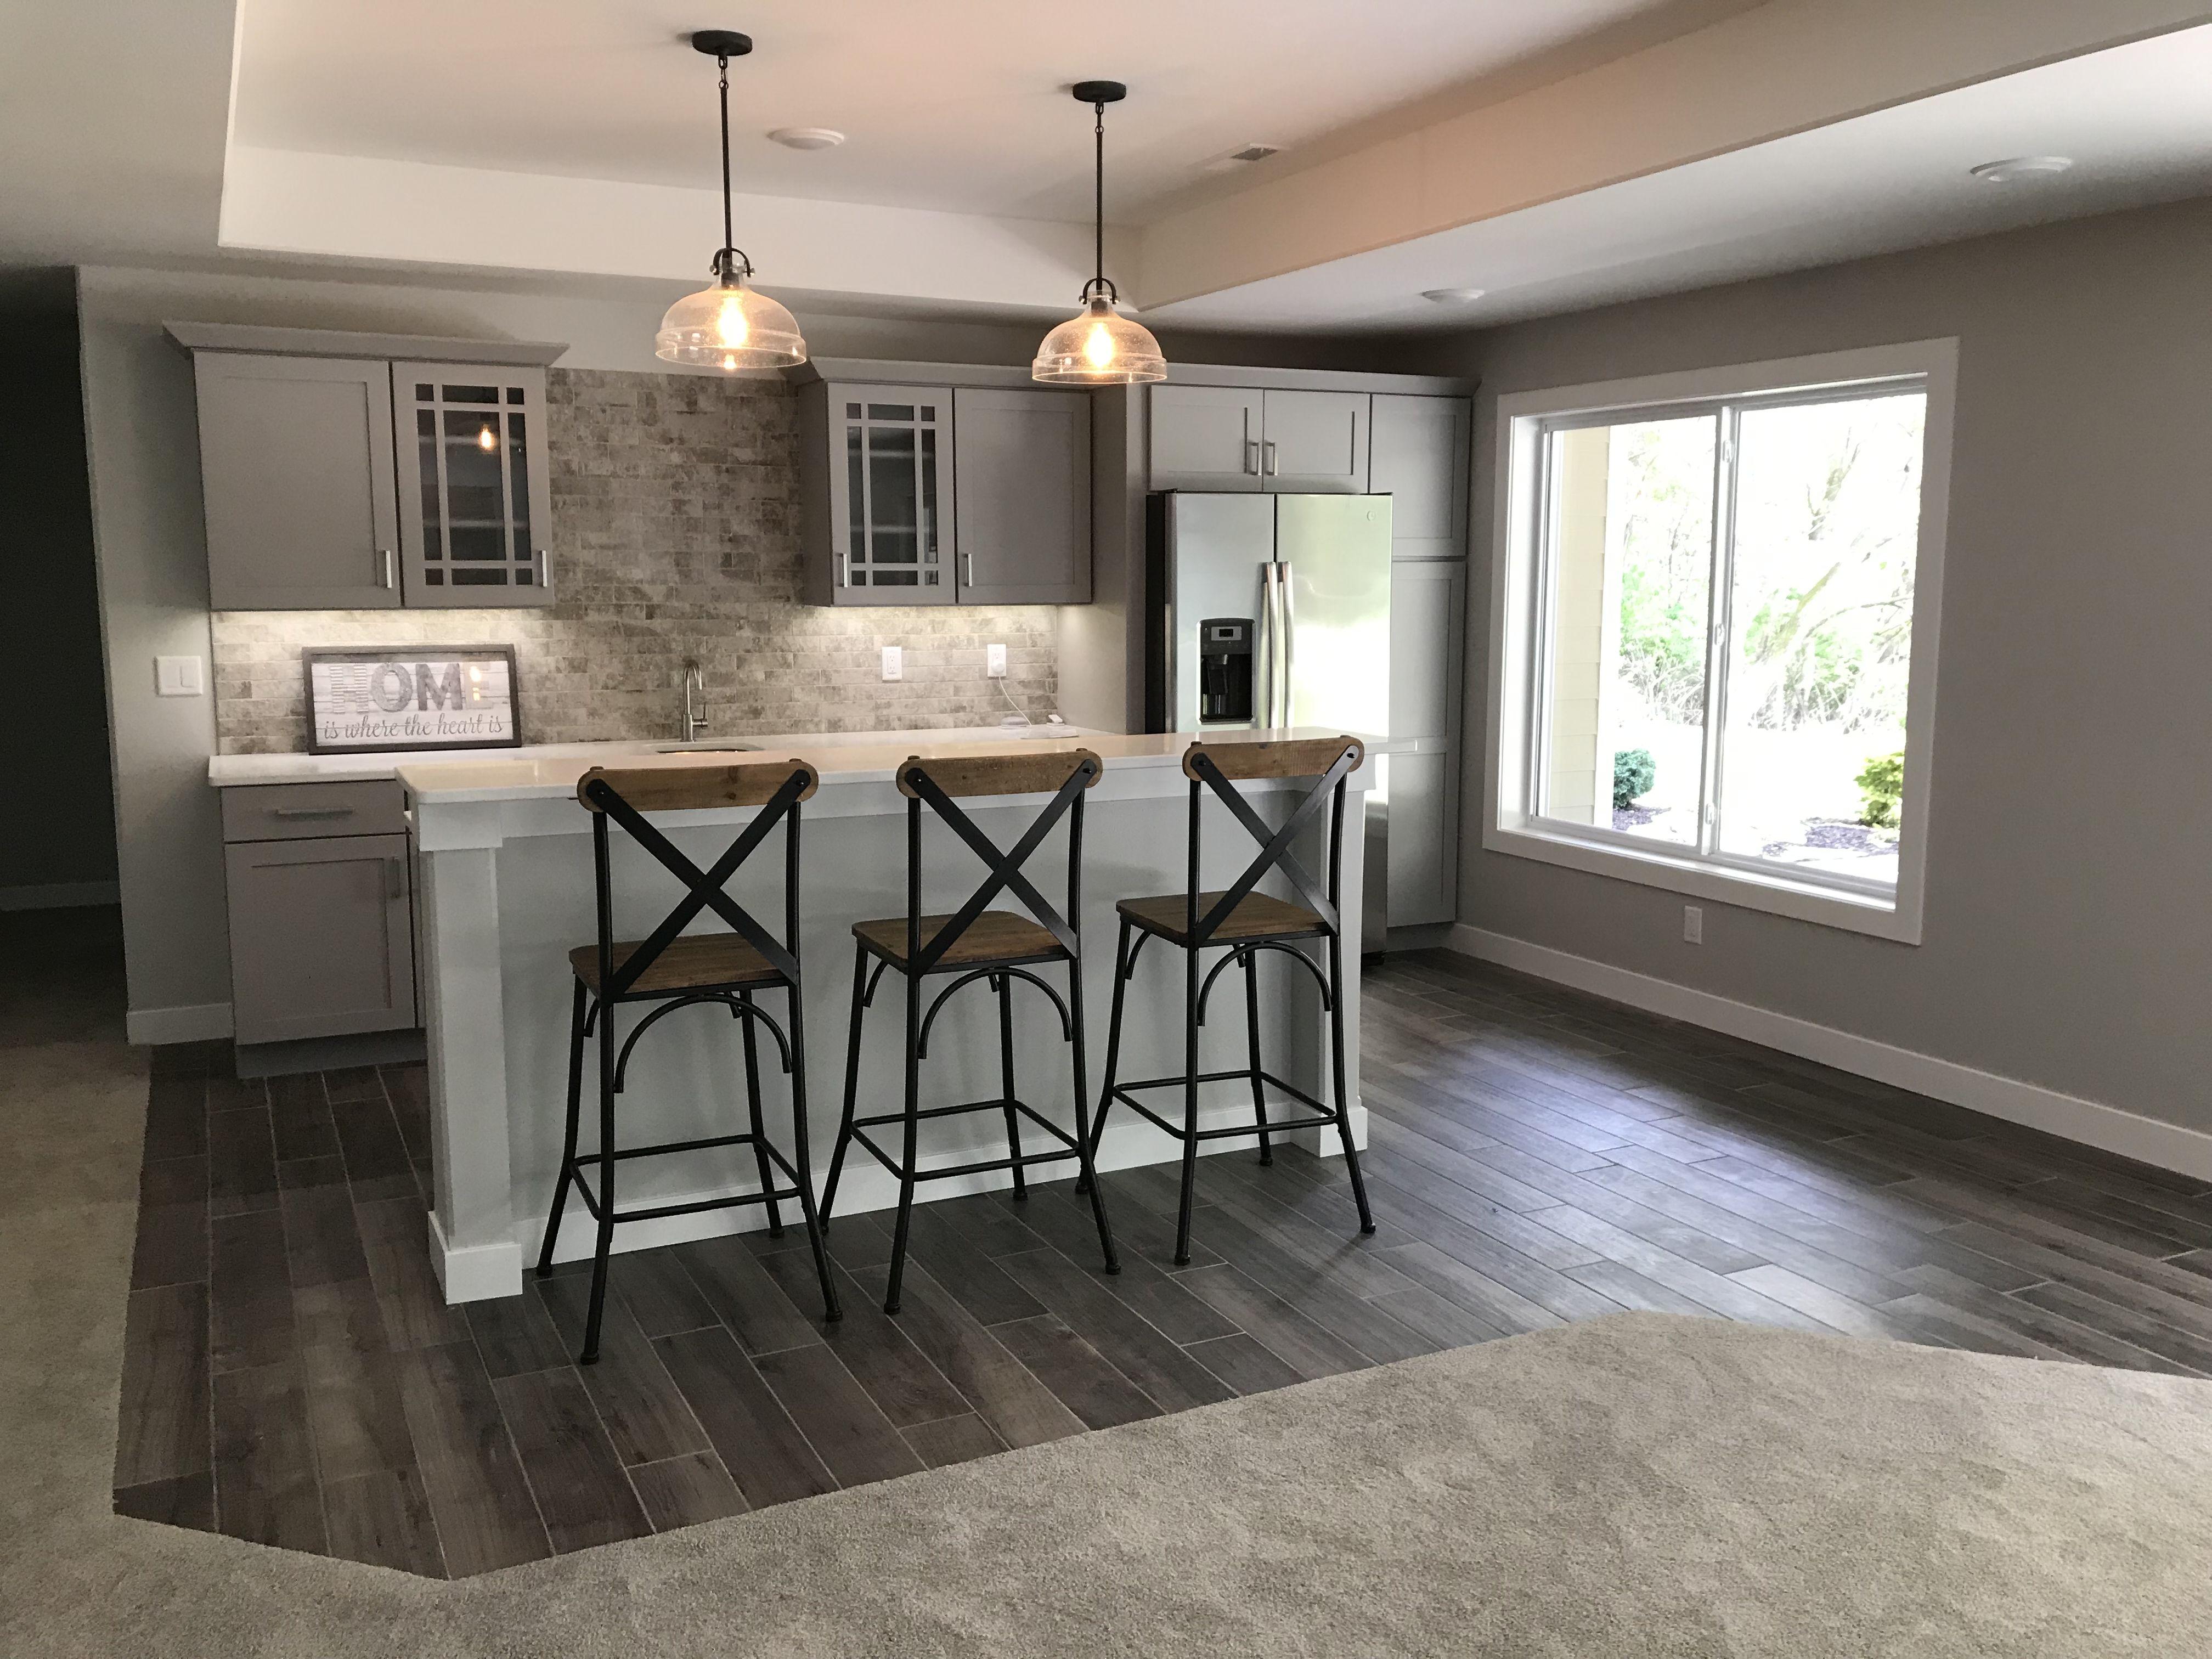 Bar Backsplash In A White Gray Brick Tile Tile Wood Look Tile On